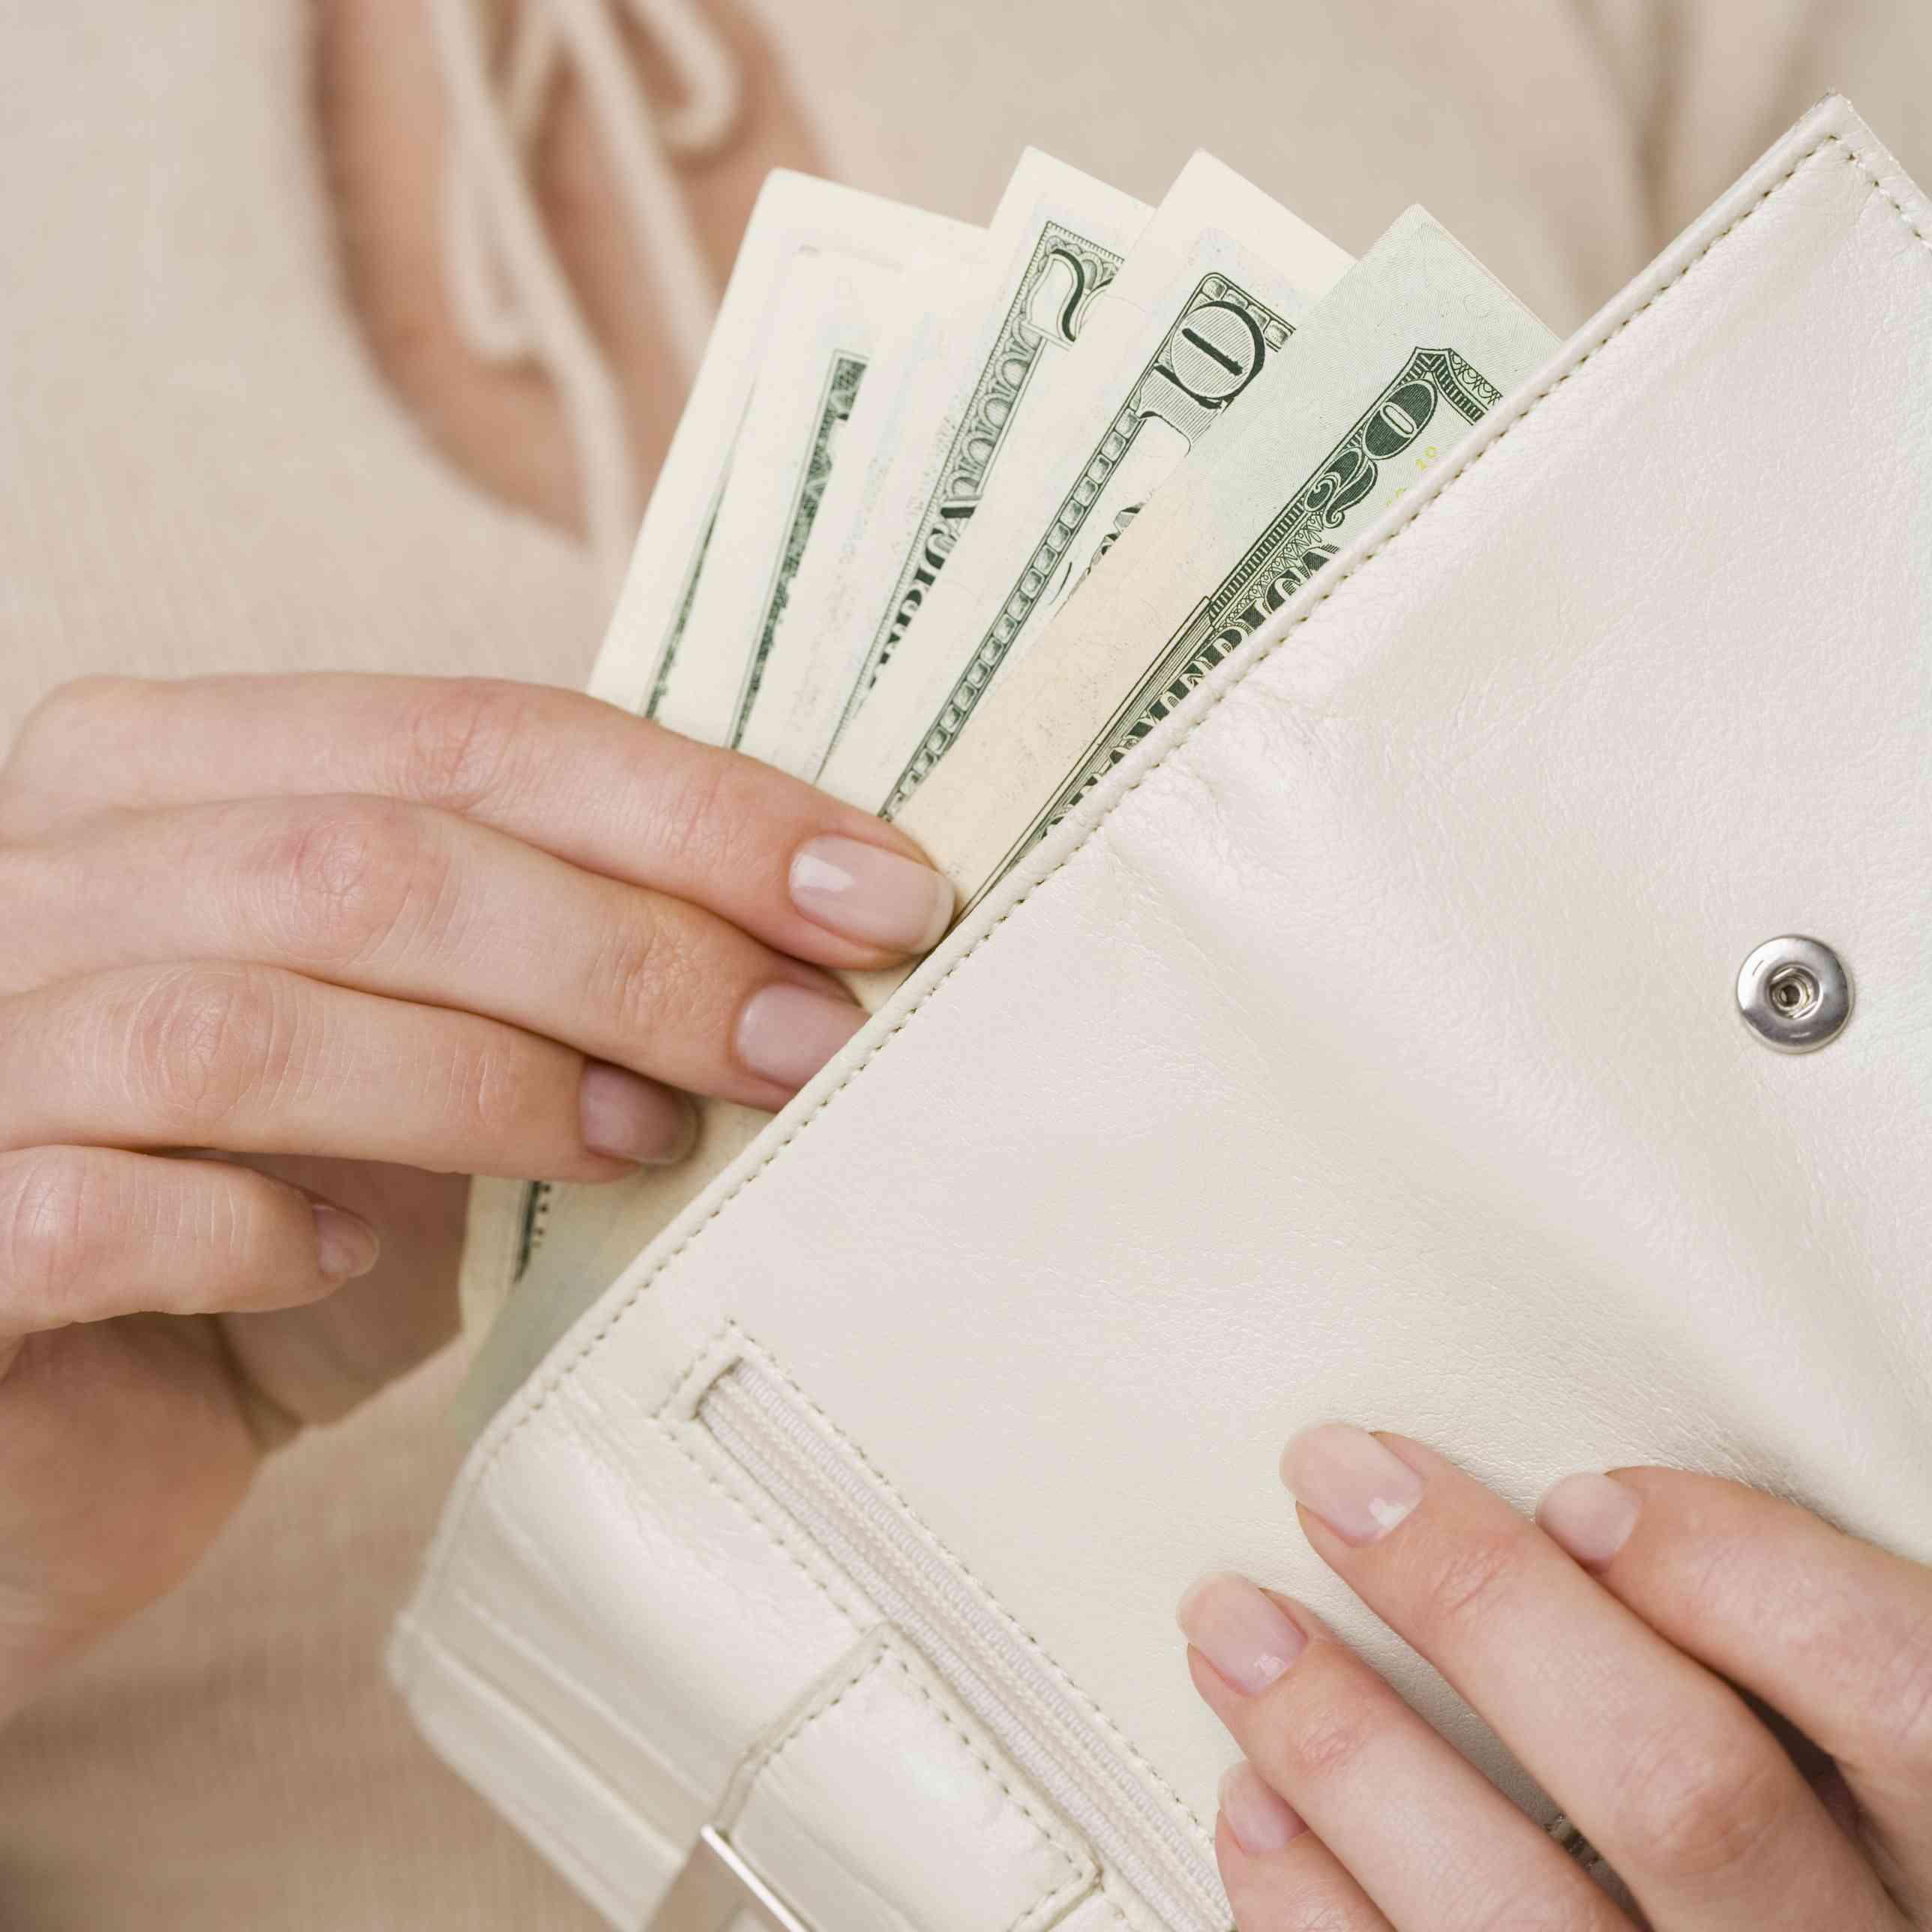 Organice su billetera